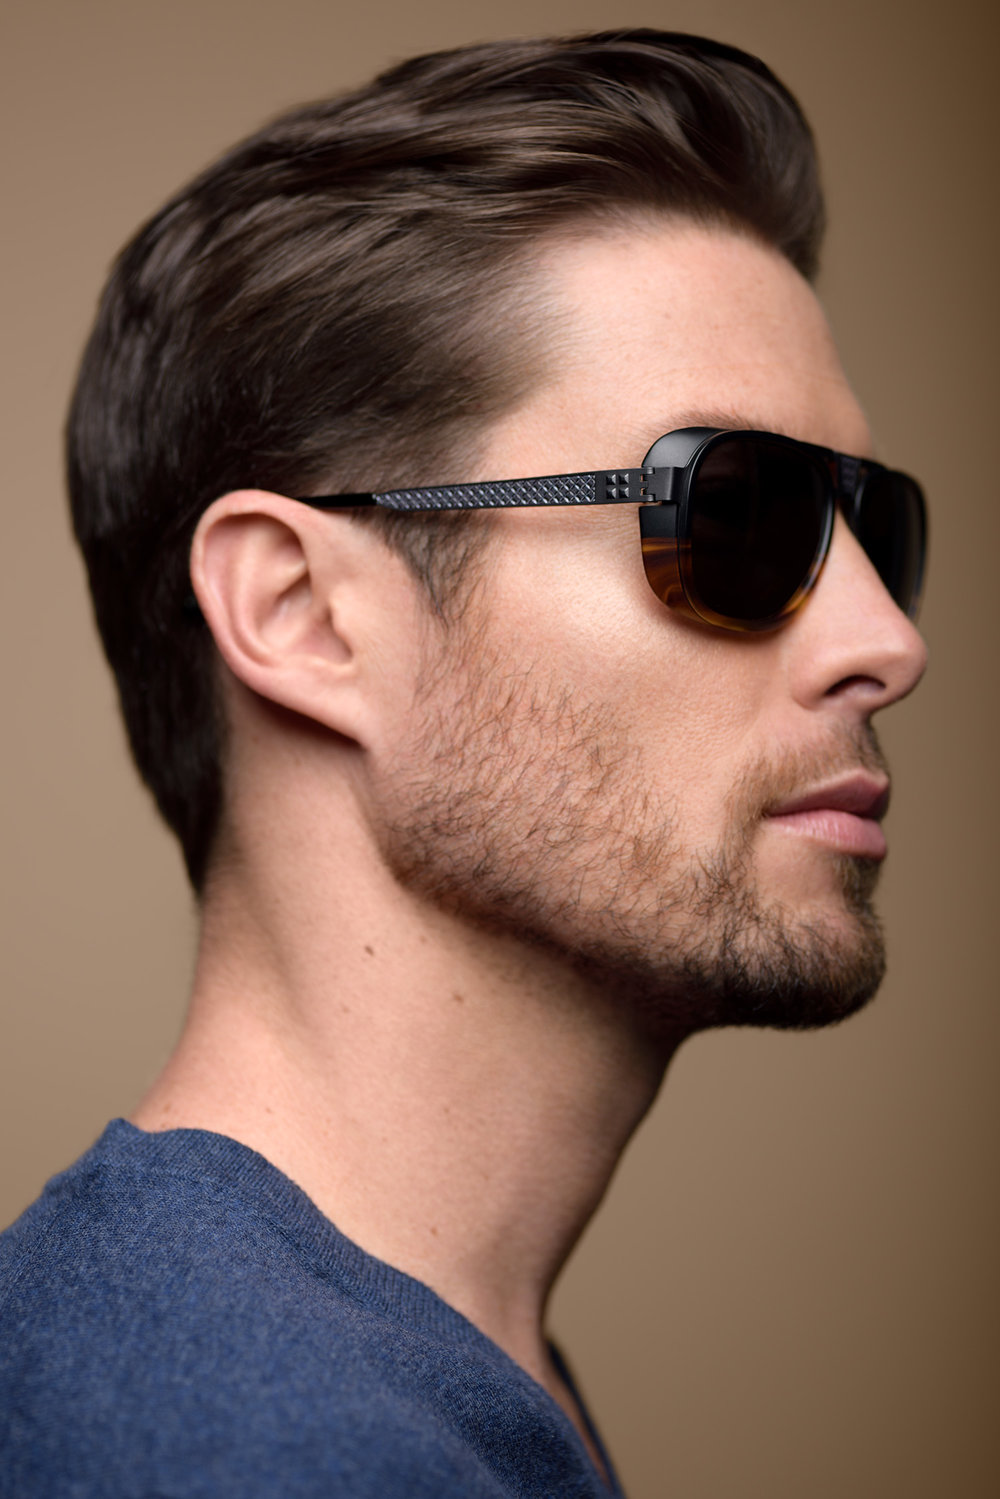 chadd-smith-sunglasses-copyright-melis-dainon.jpg